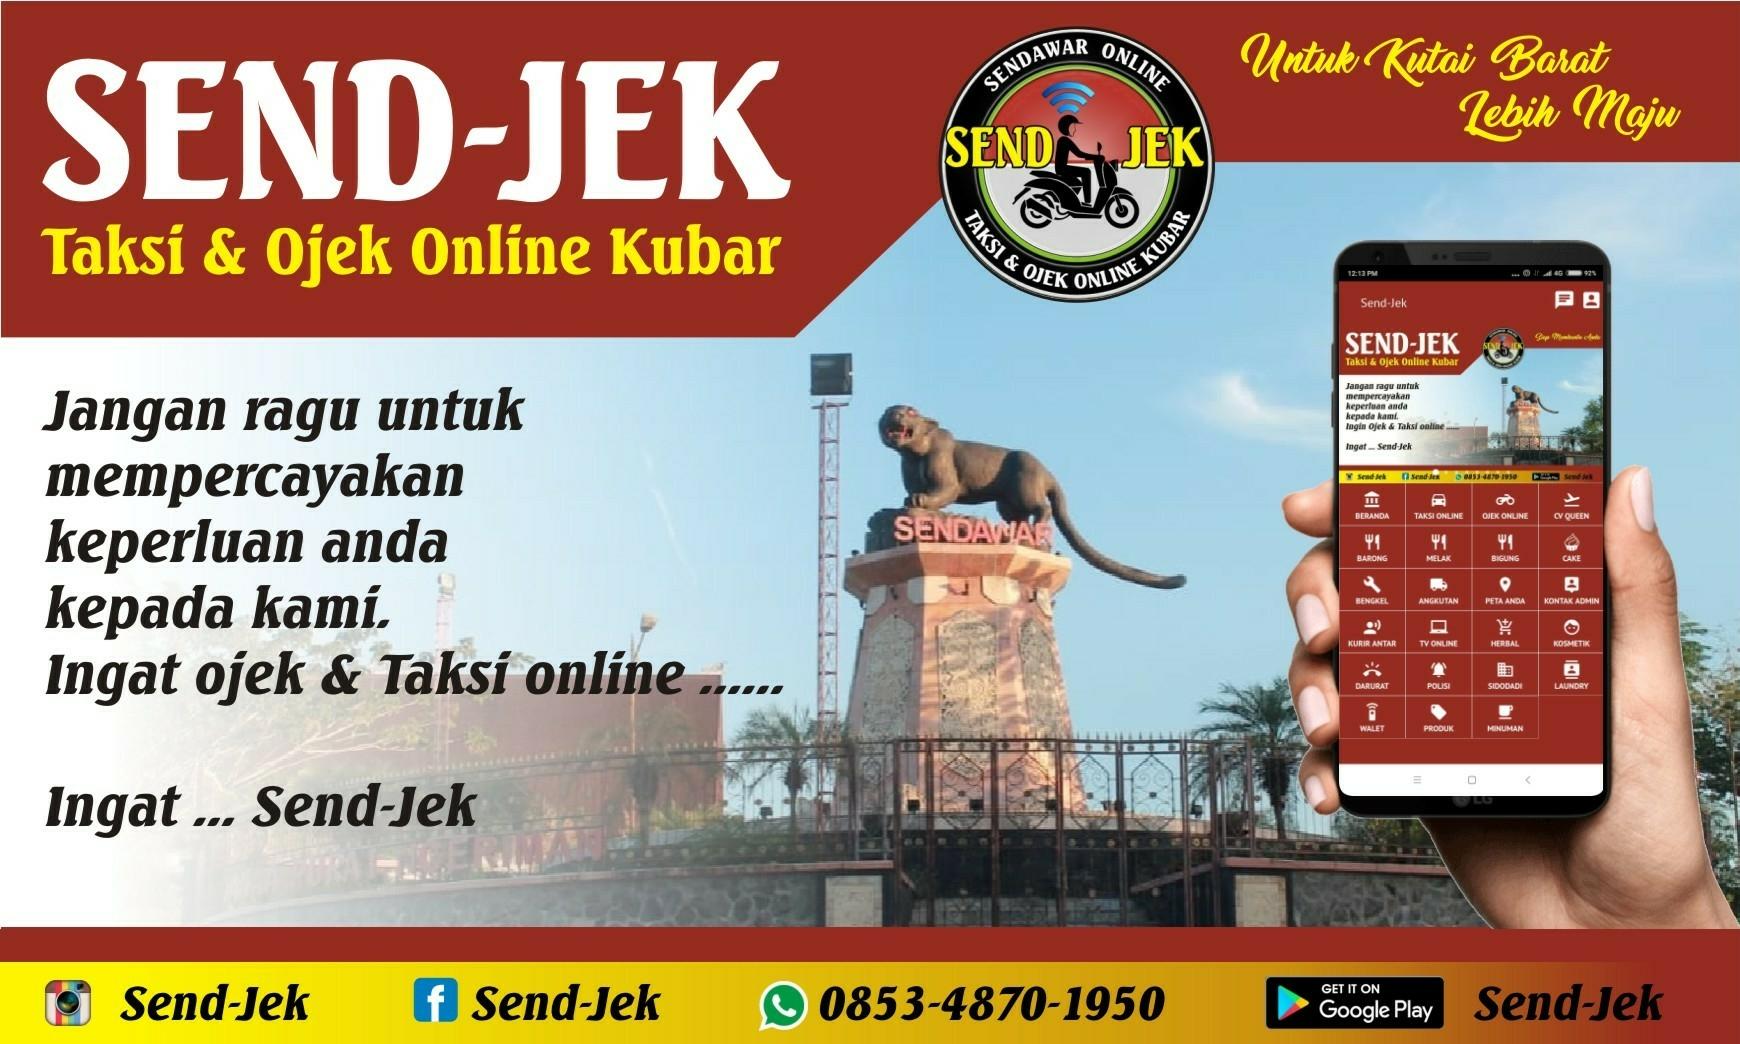 Send-Jek 7